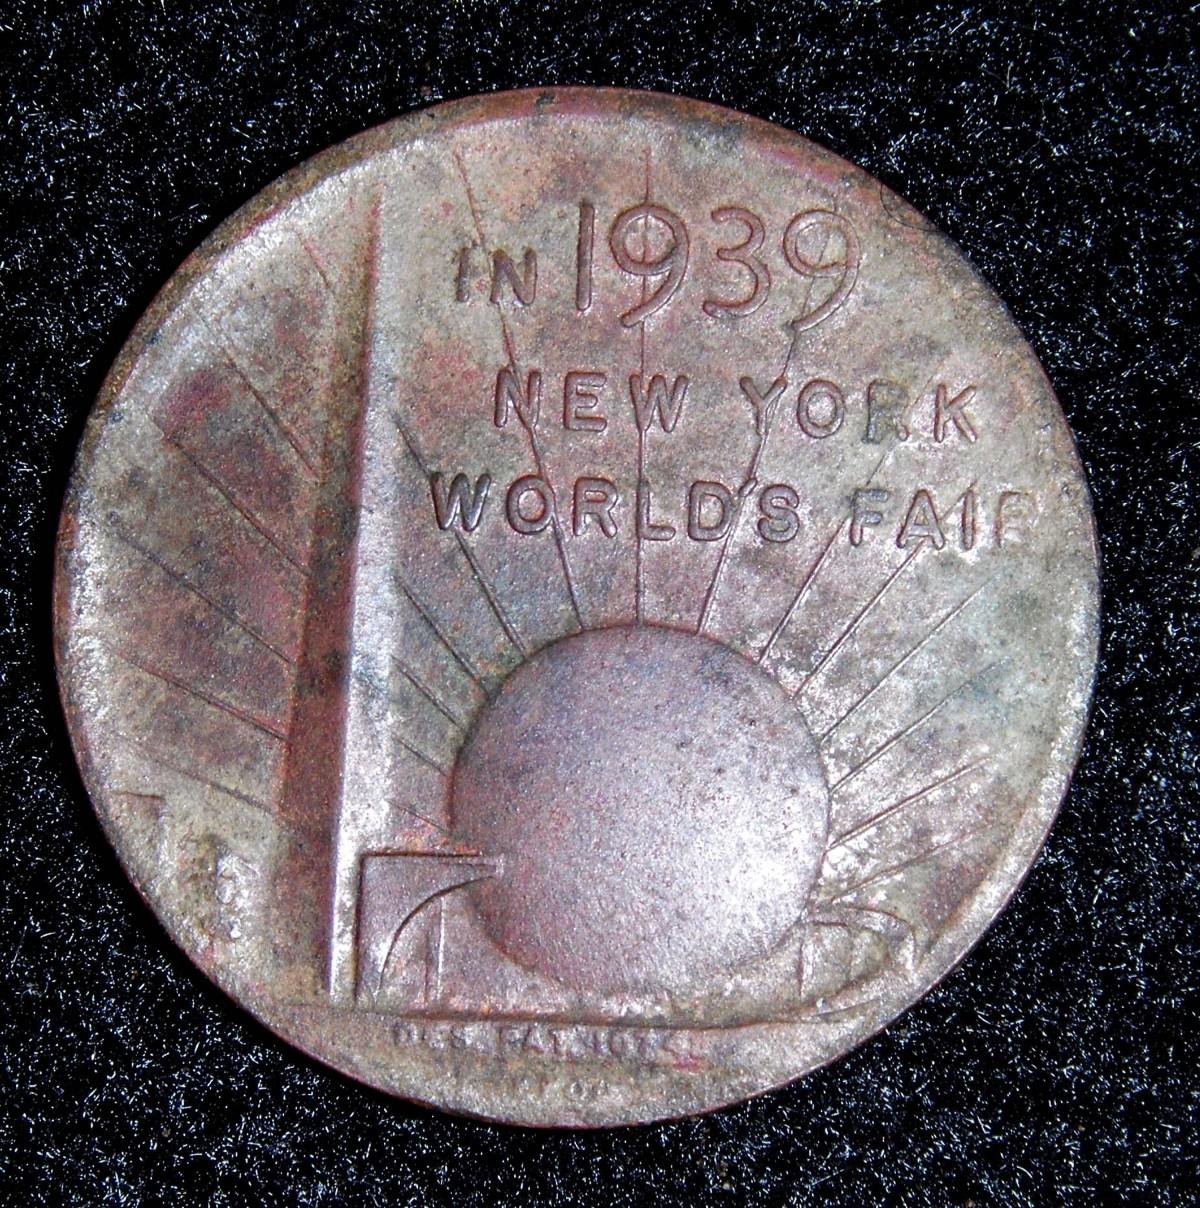 beliebte alt coins